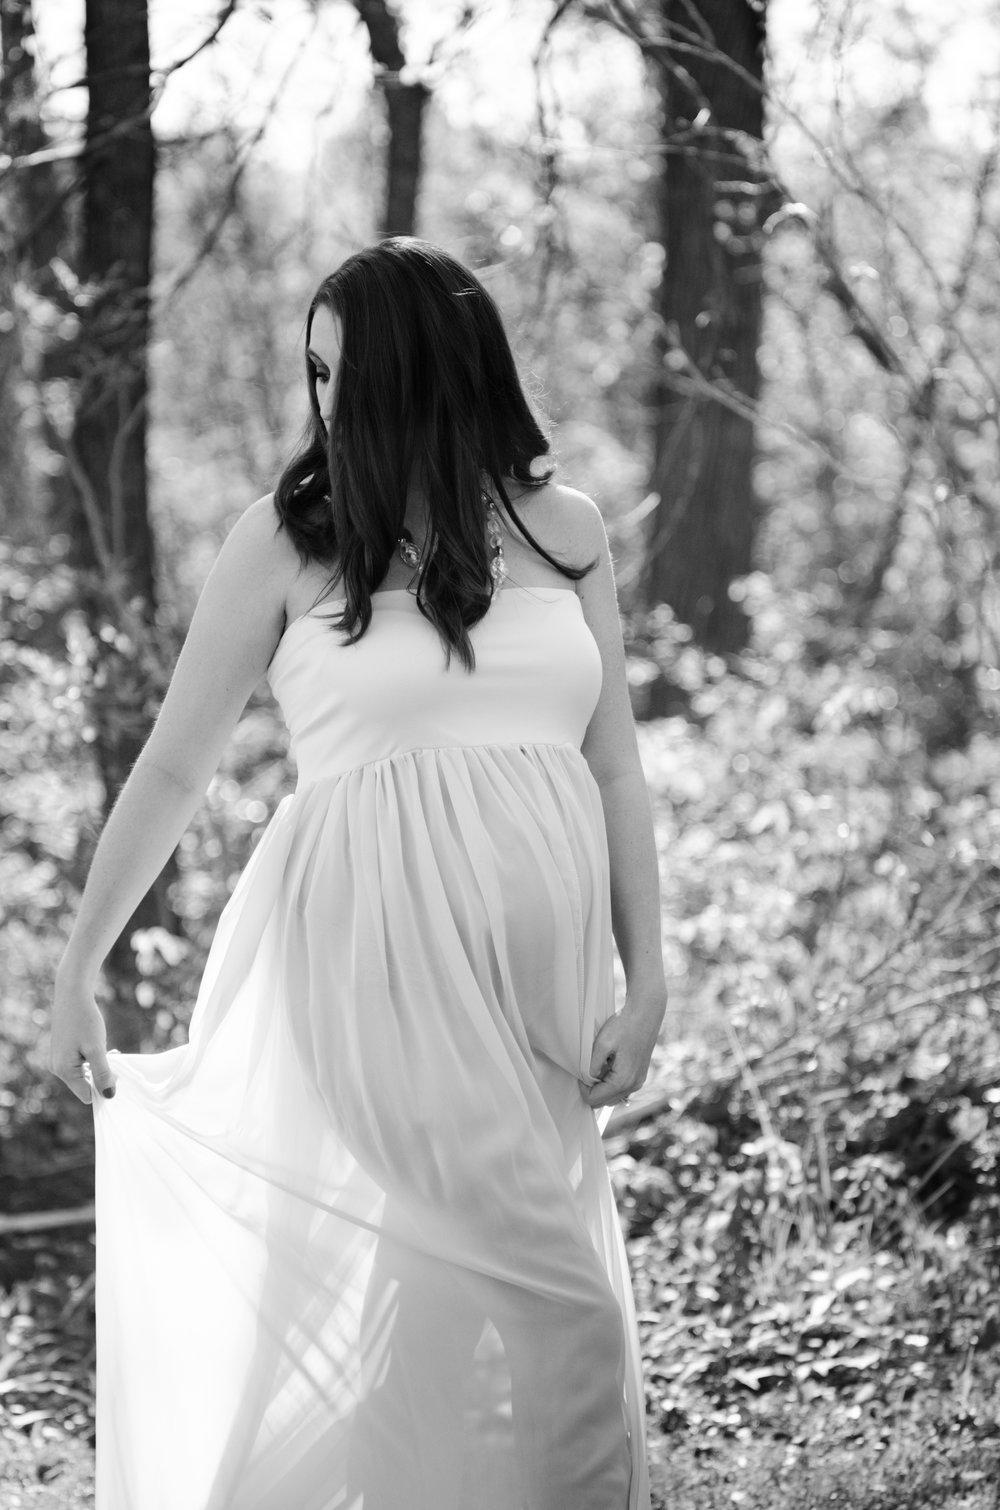 sarah's maternity session | anne bertelson photography | plano, frisco, richardson, mckinney, dallas, allen maternity photographer | www.annebertelsonphotography.com |